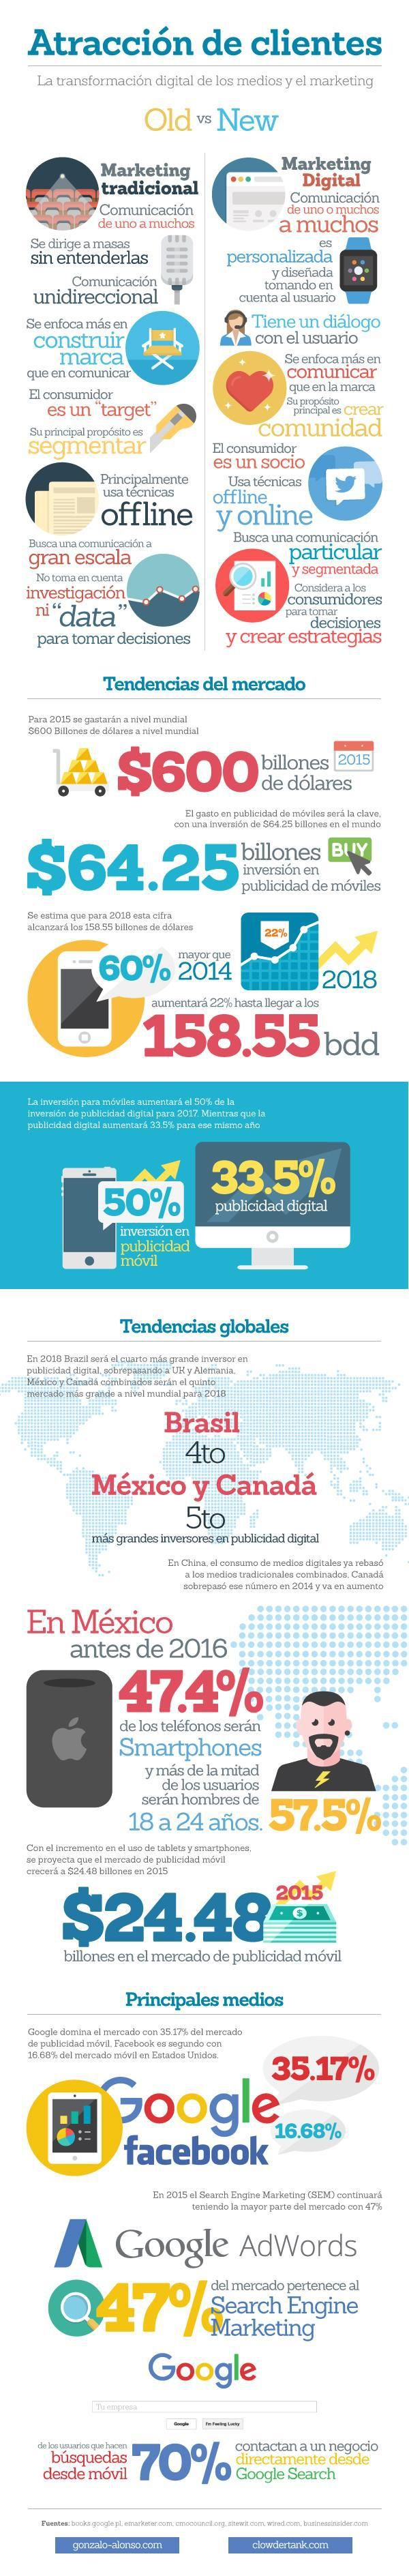 Transformación digital del Marketing #infografia #infographic #marketing